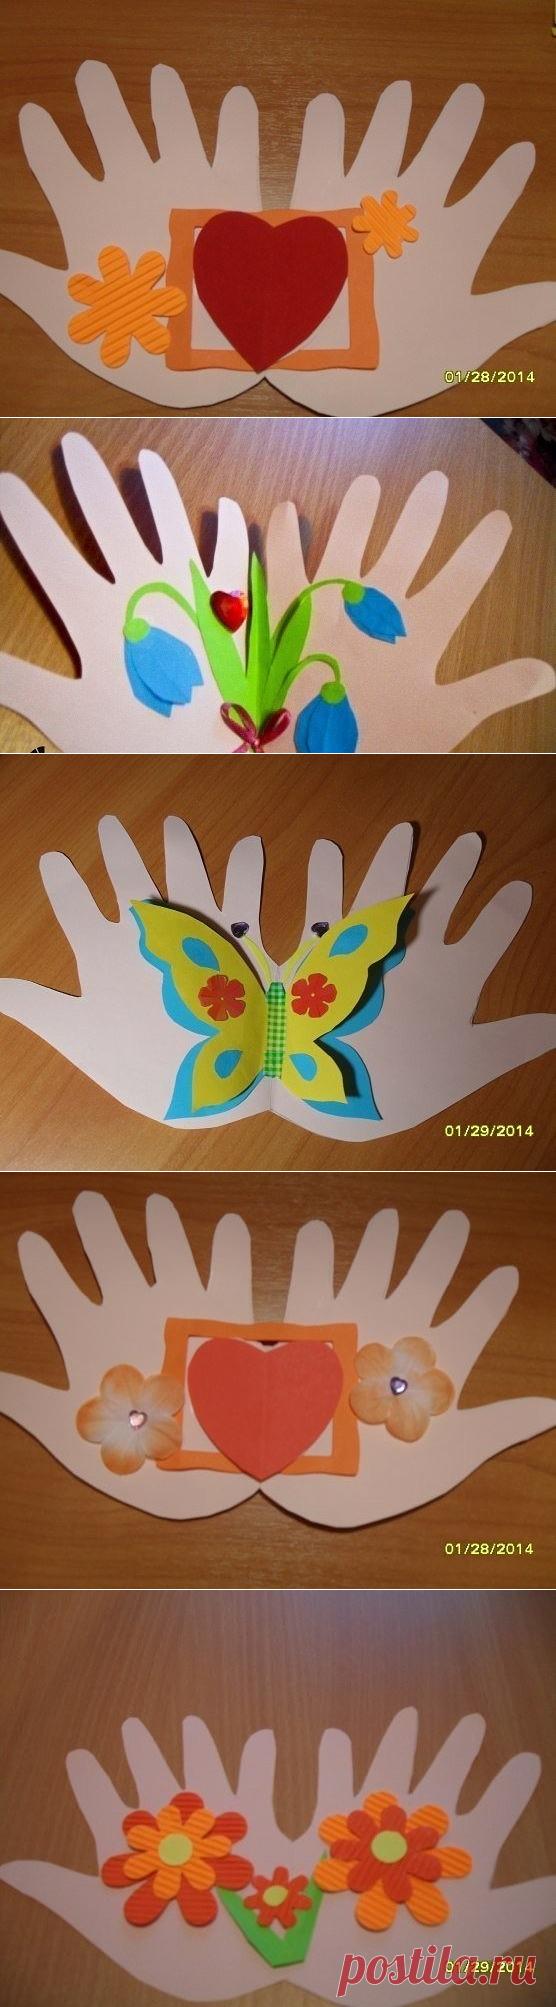 Чехол на телефон для ребенка своими руками